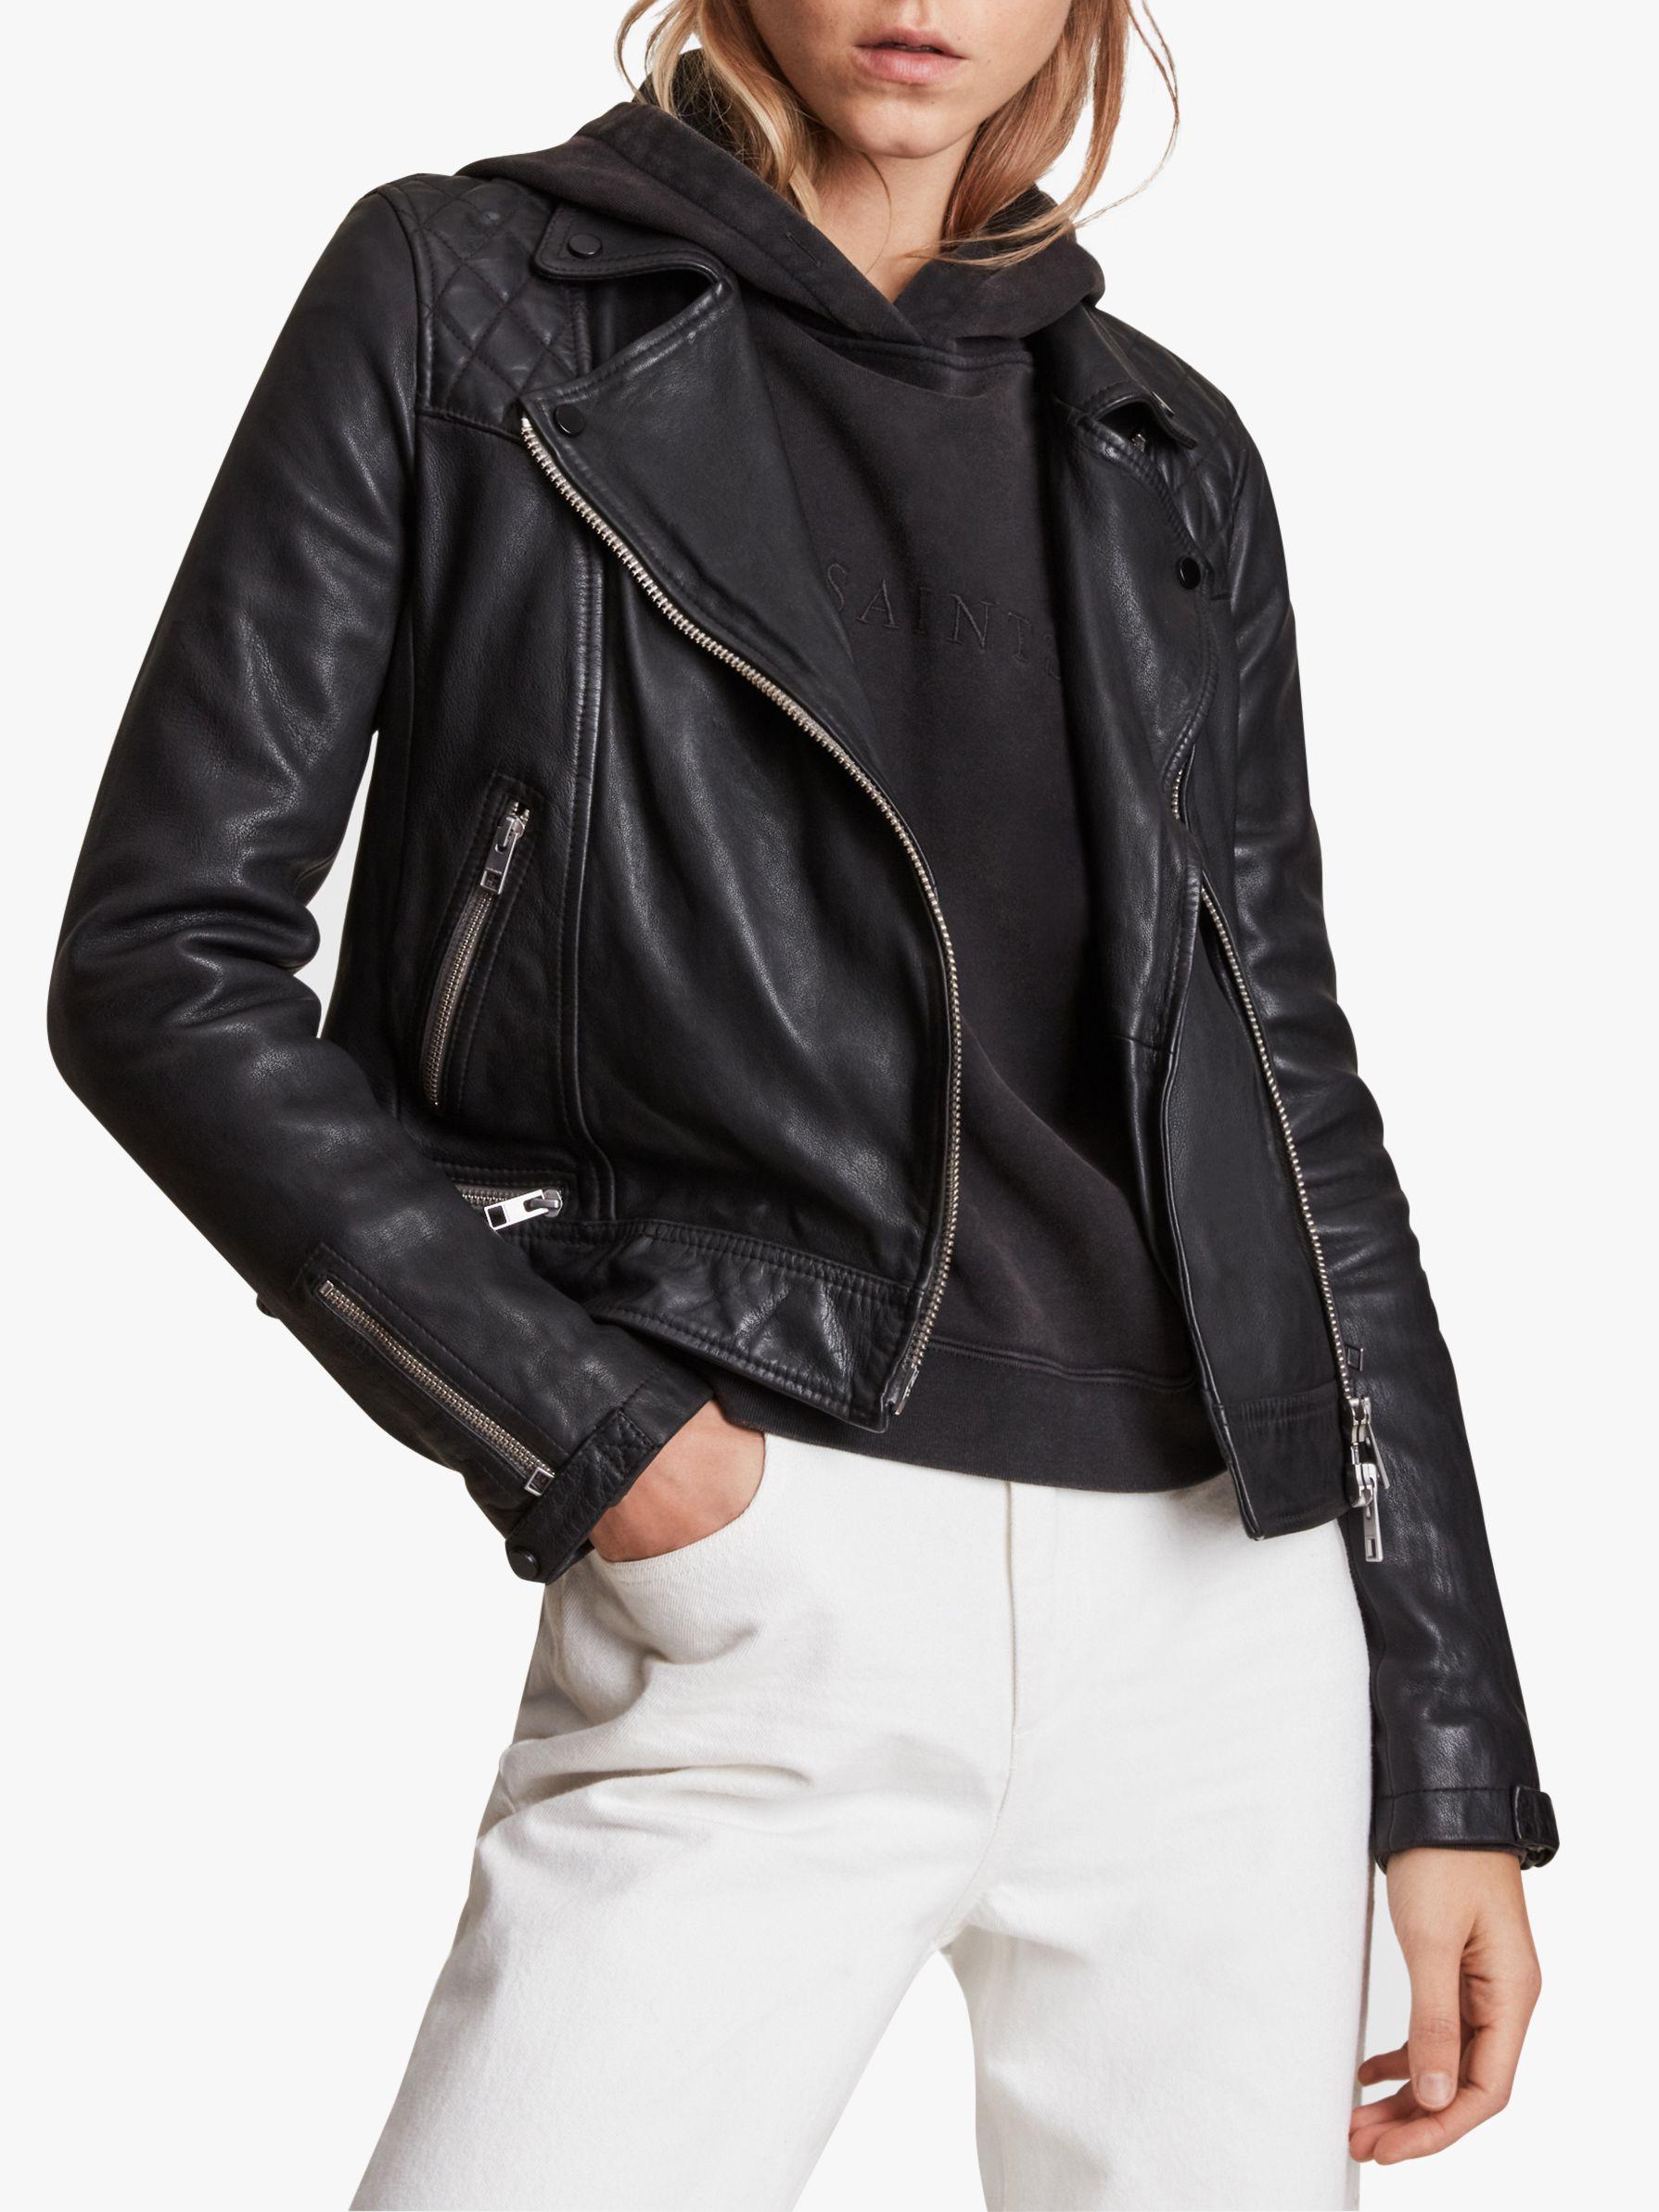 AllSaints AllSaints Conroy Leather Biker Jacket, Ink